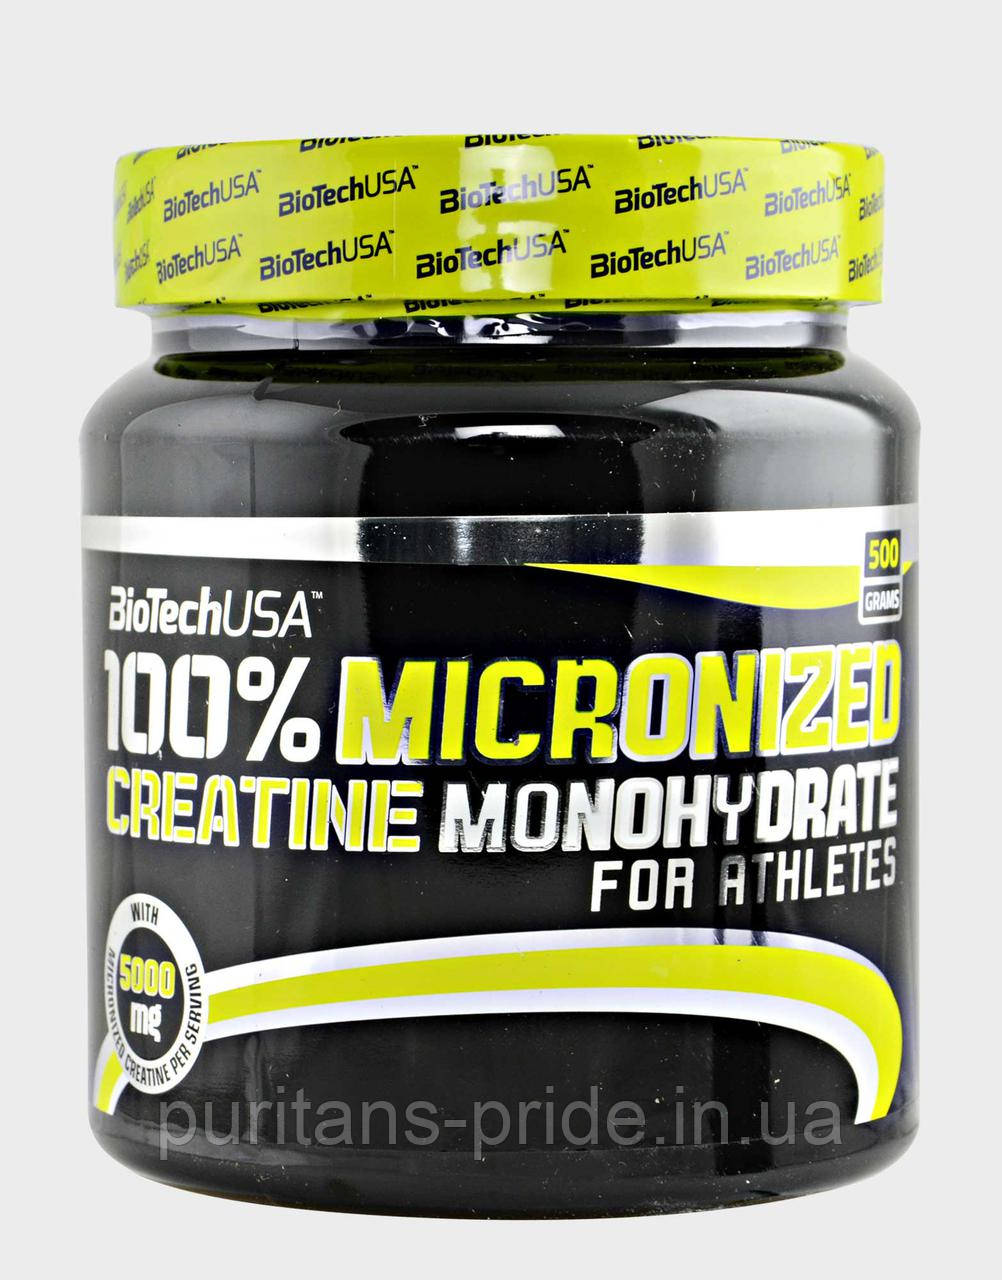 Креатин, Моногидрат, BioTech  USA100% Creatine Monohydrate 500g